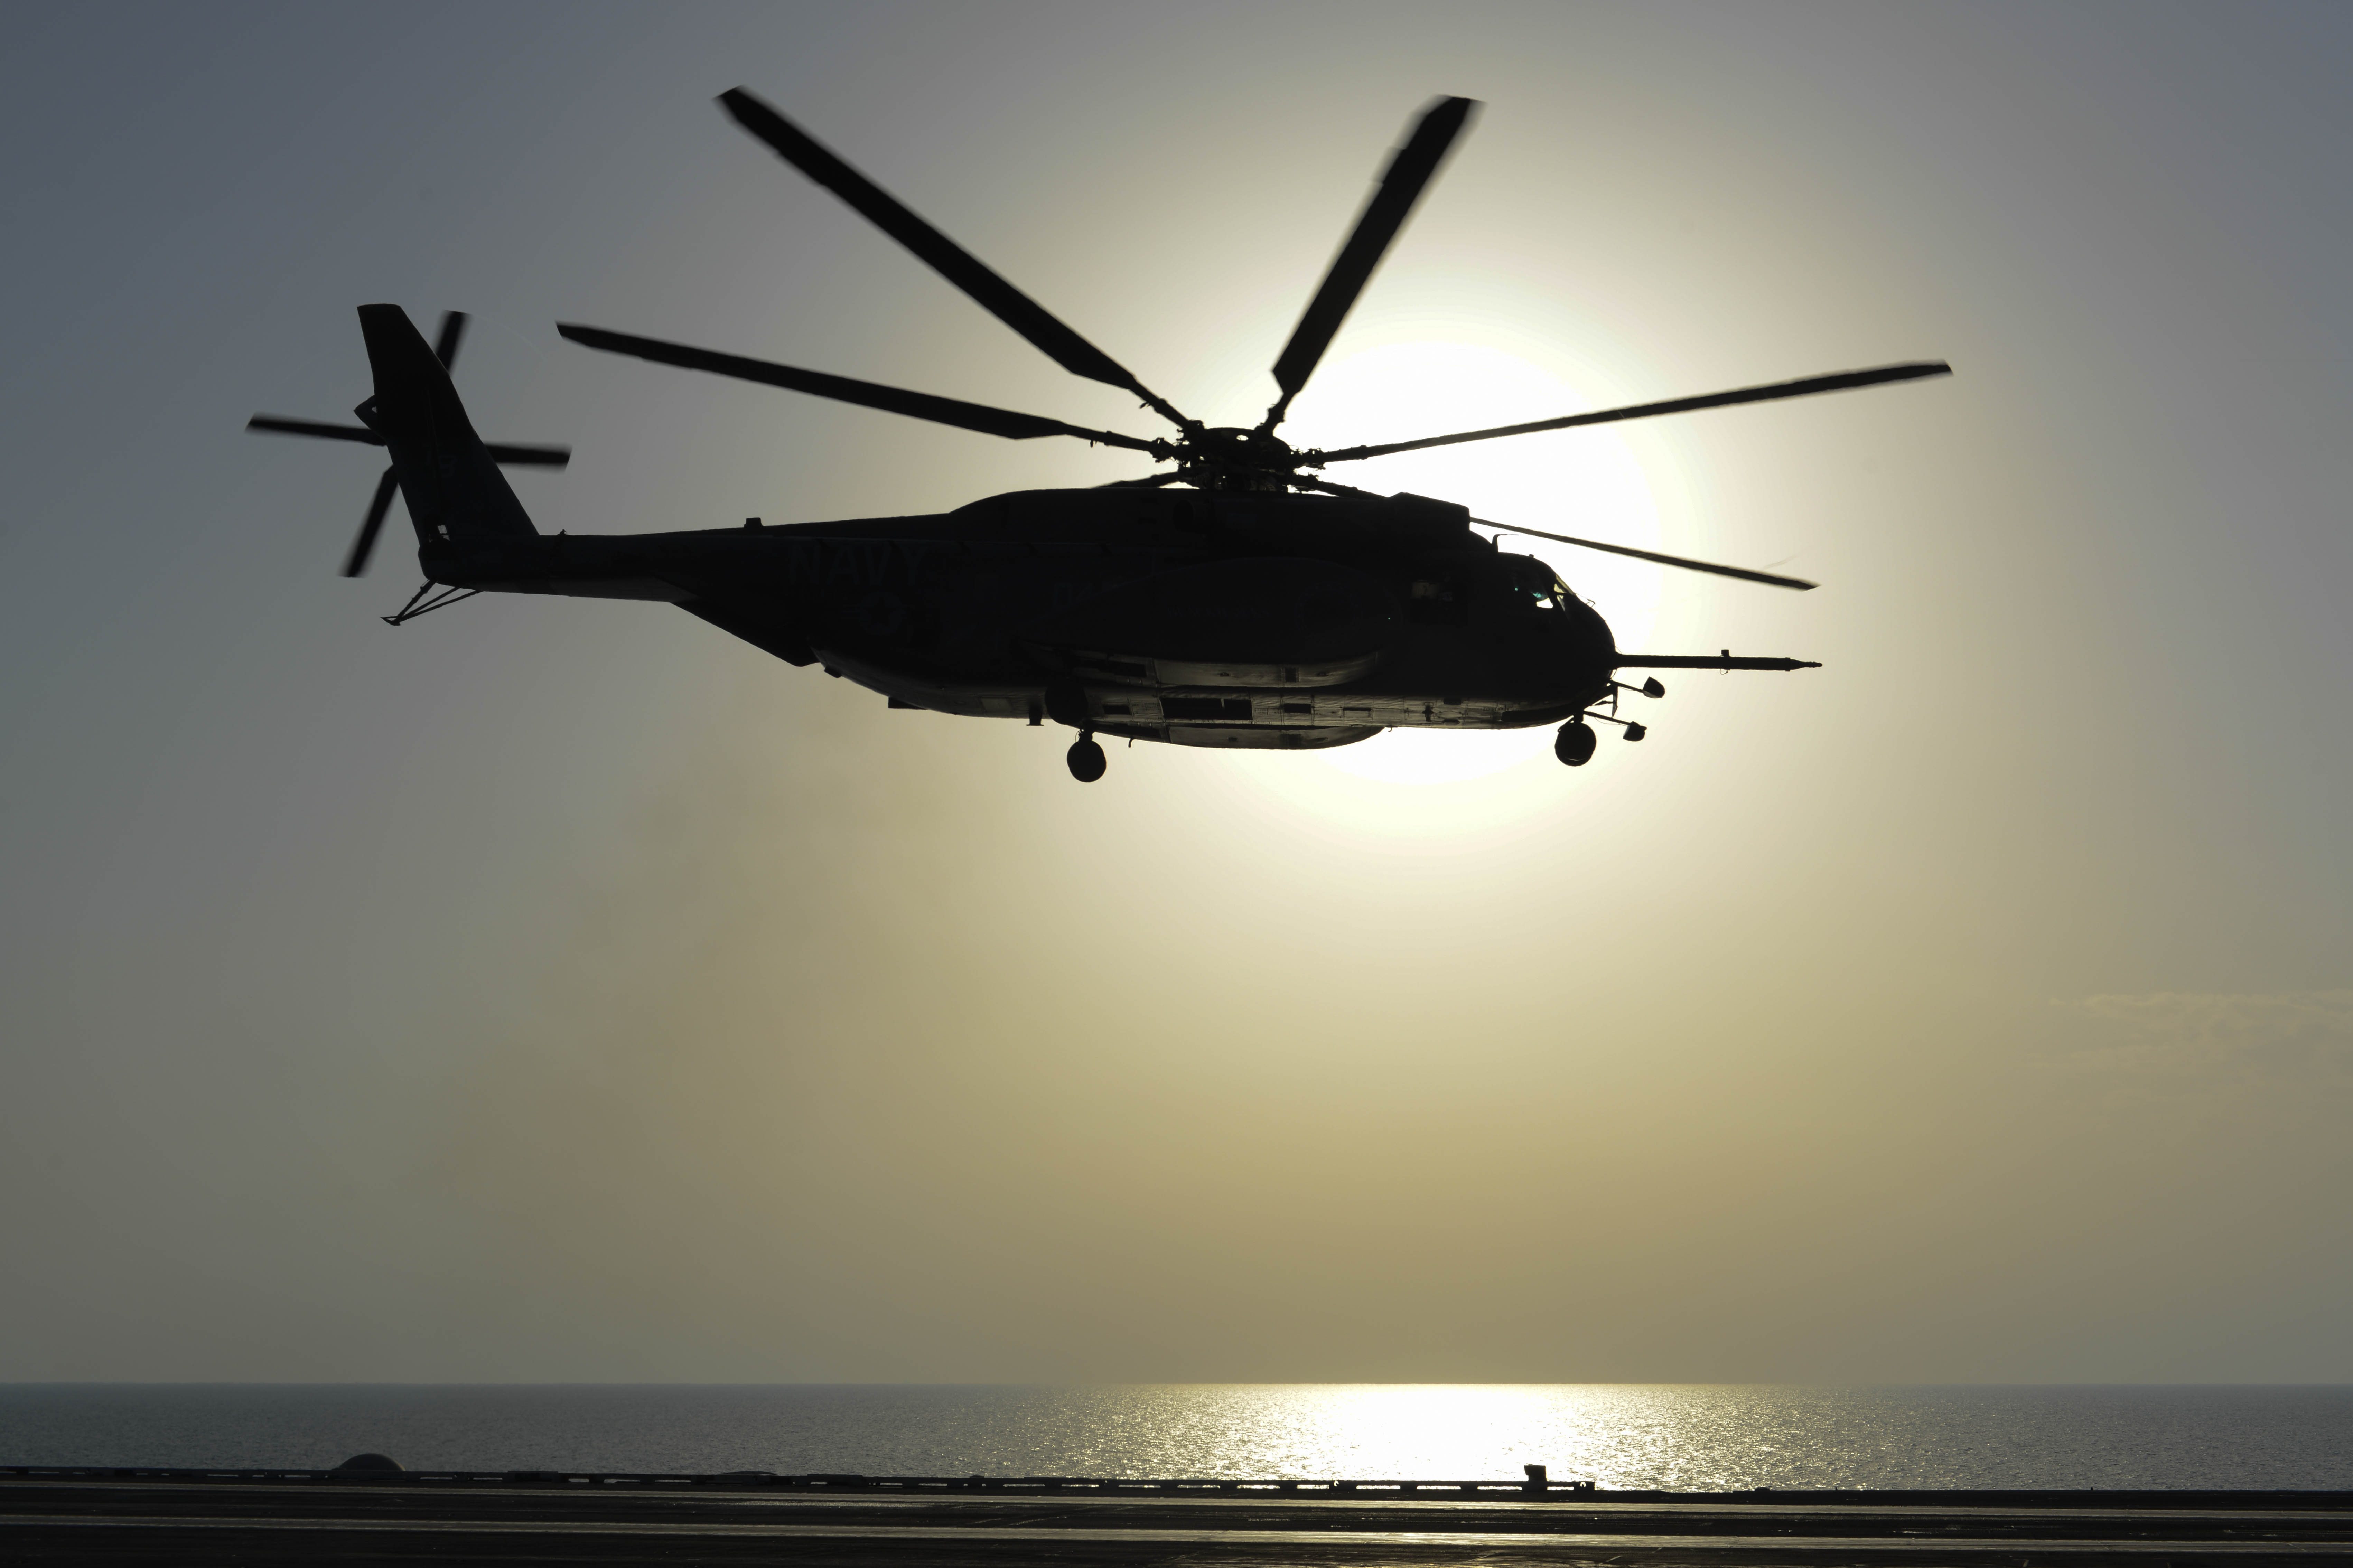 MH-53E Sea Dragon in Arabian Gulf